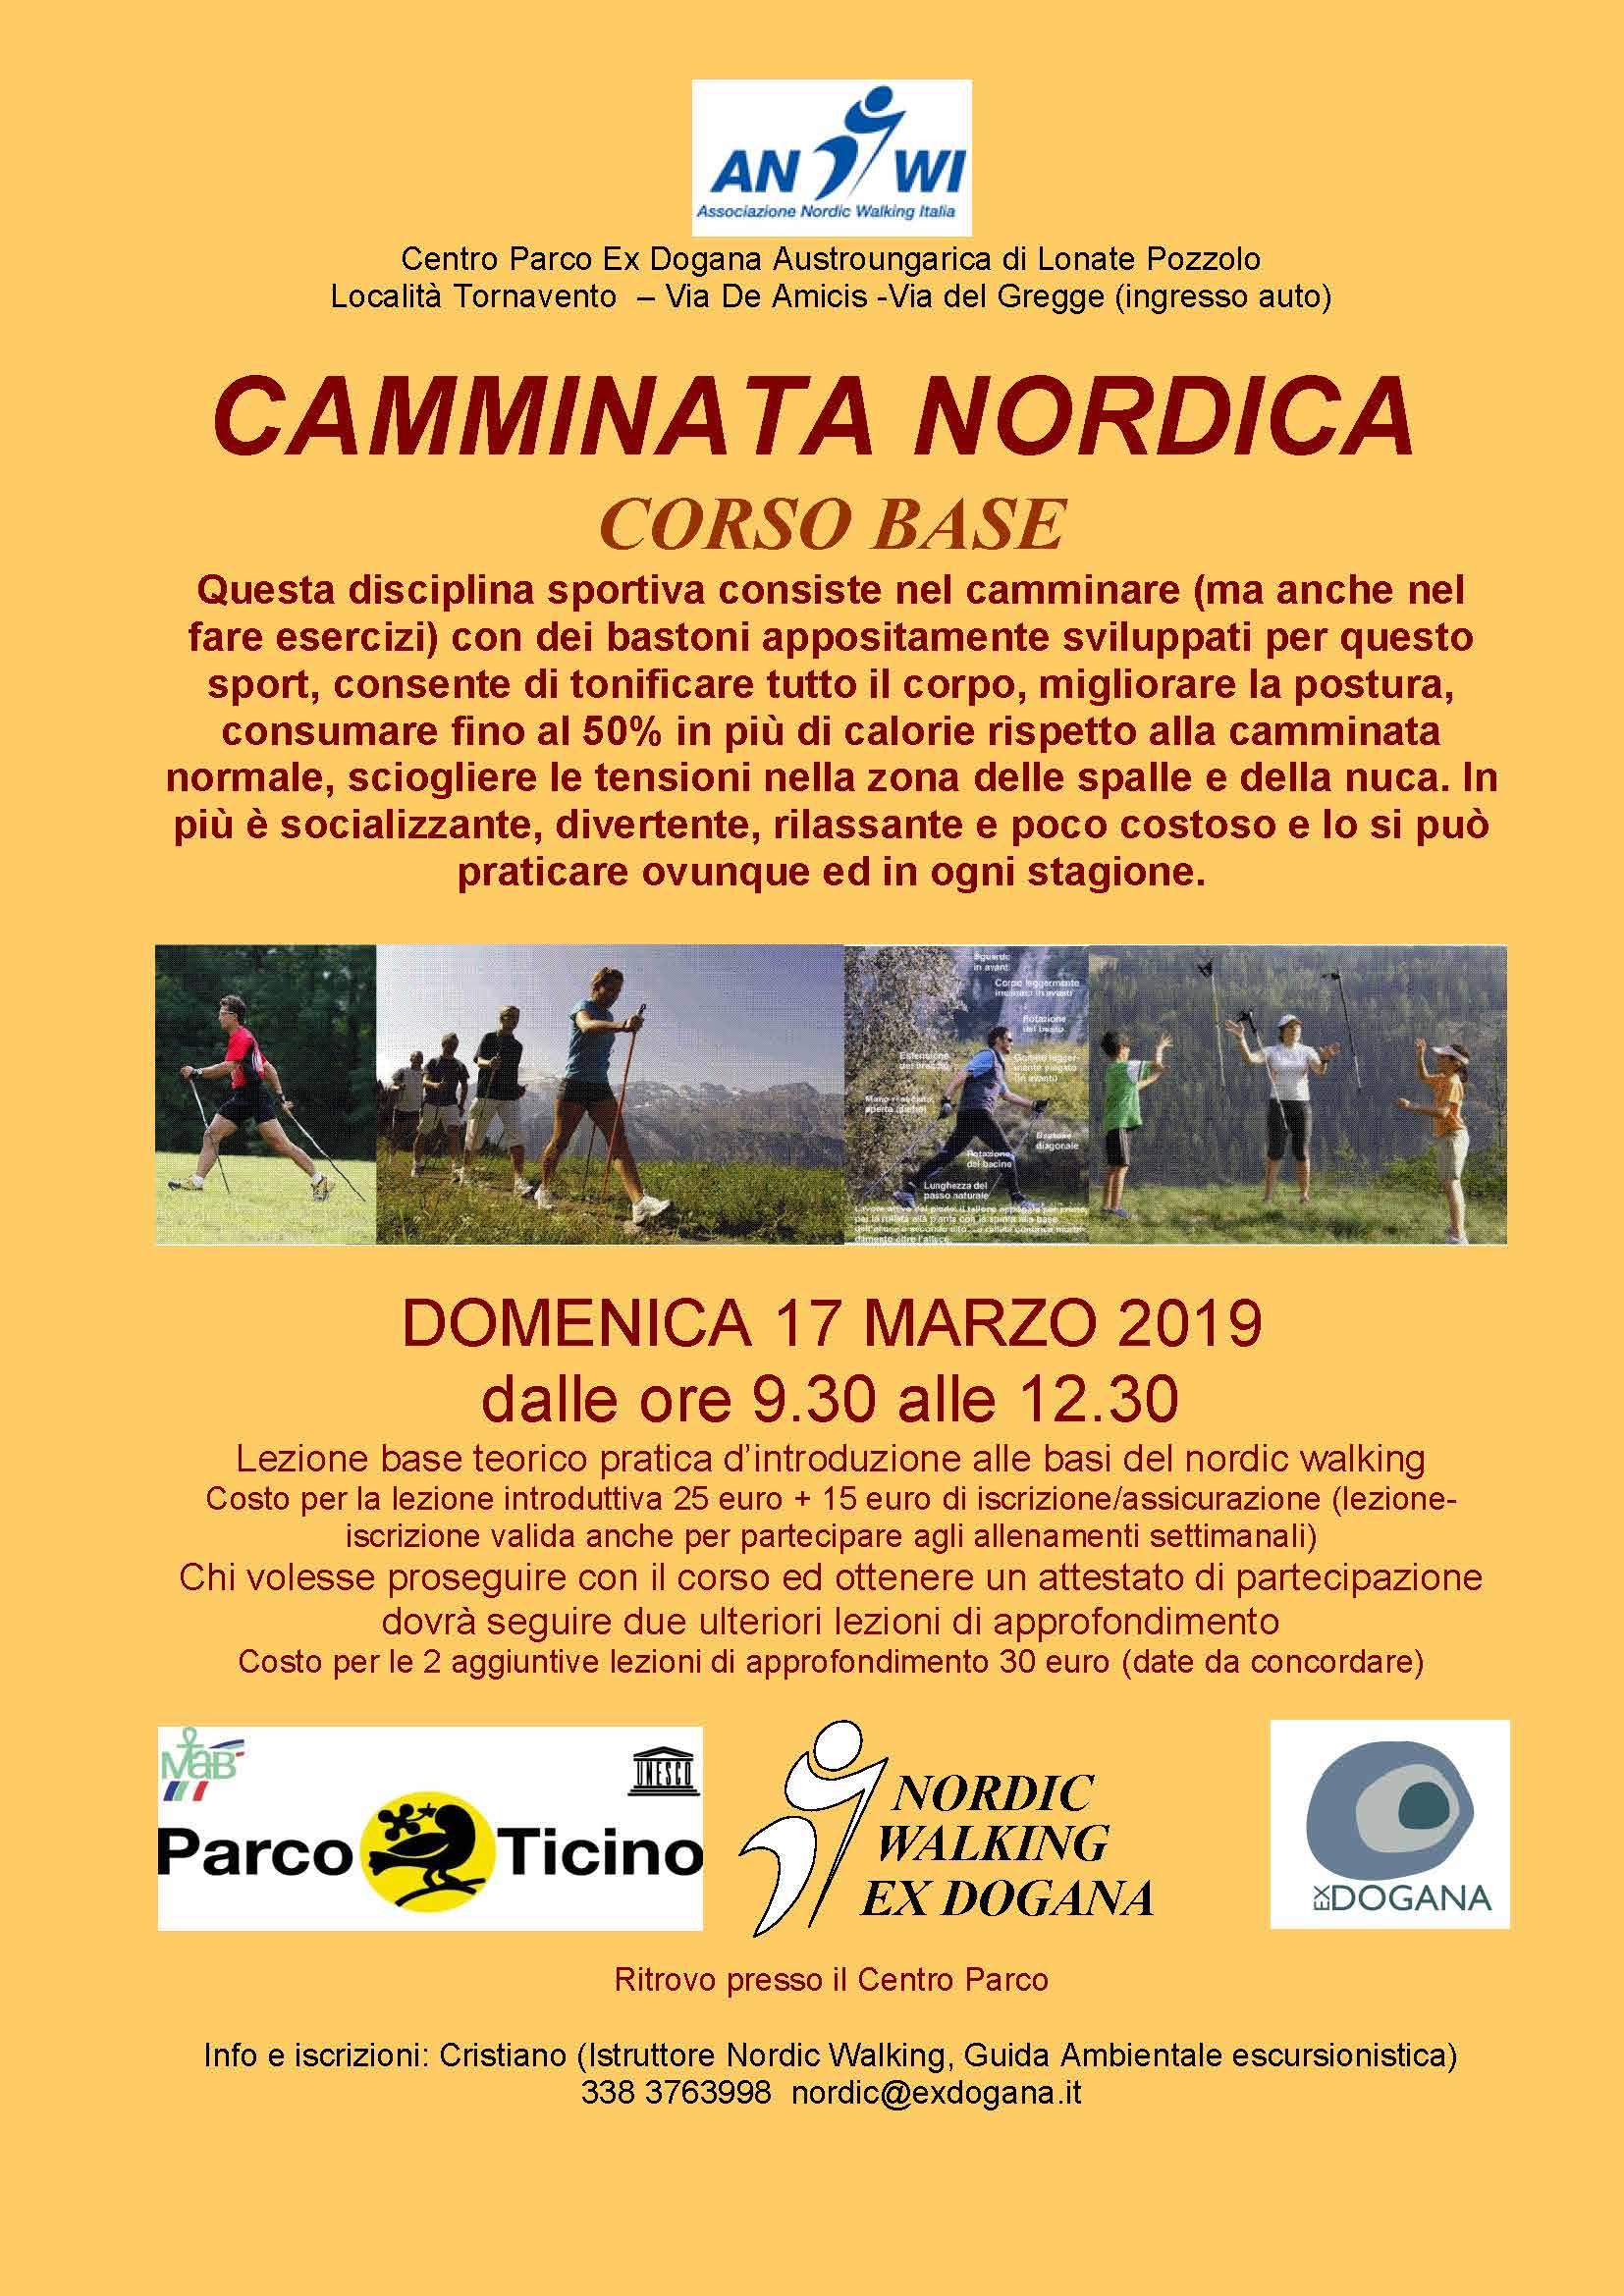 20190316_corso_base_nordic